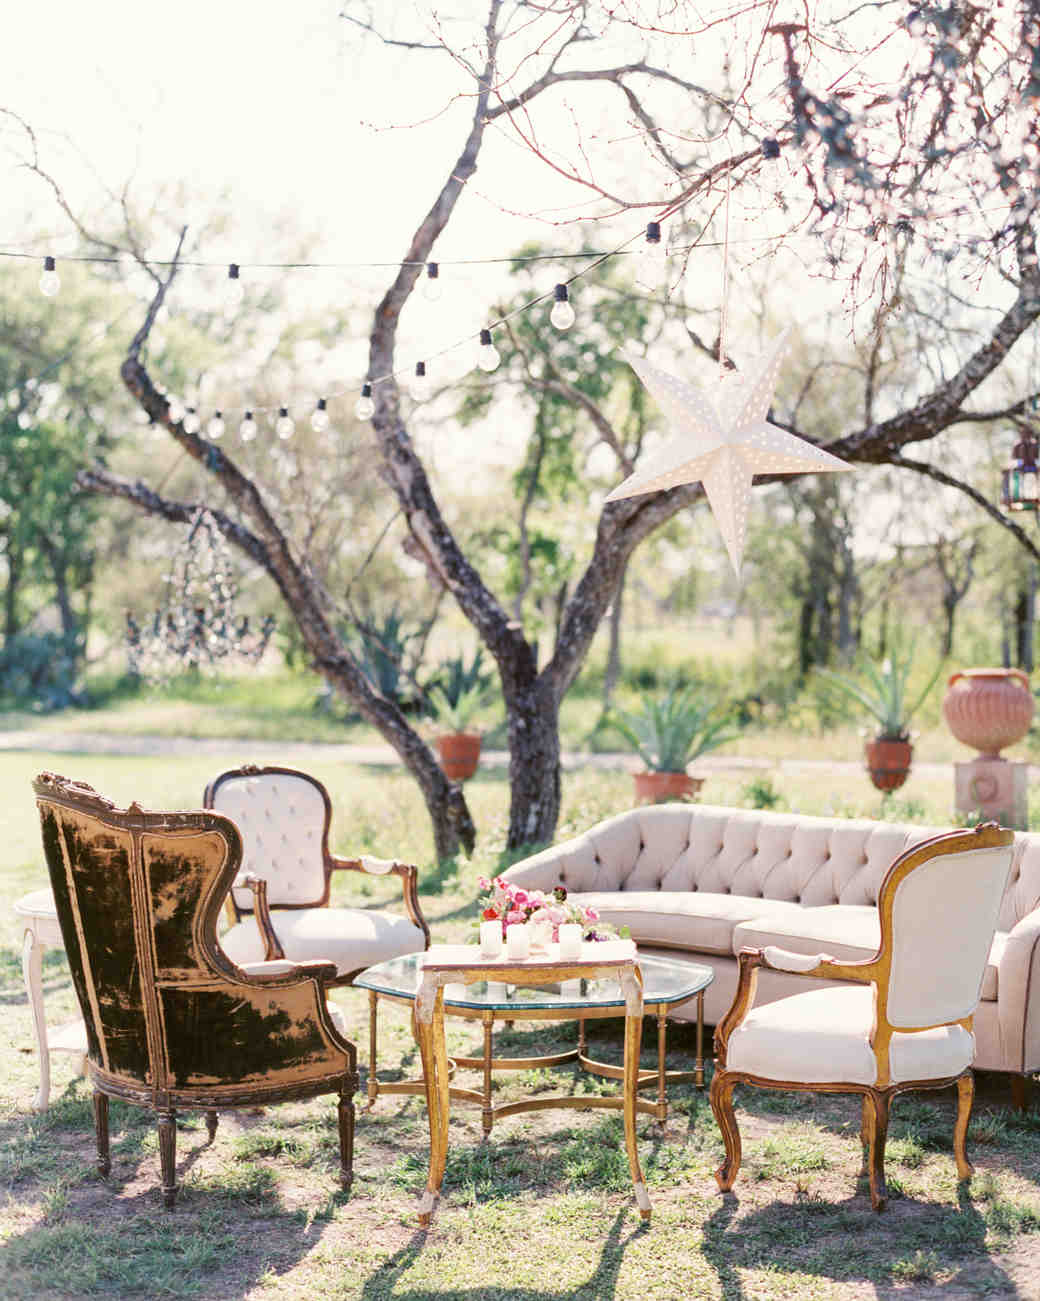 paige-chris-wedding-suite-115-s111485-0914.jpg